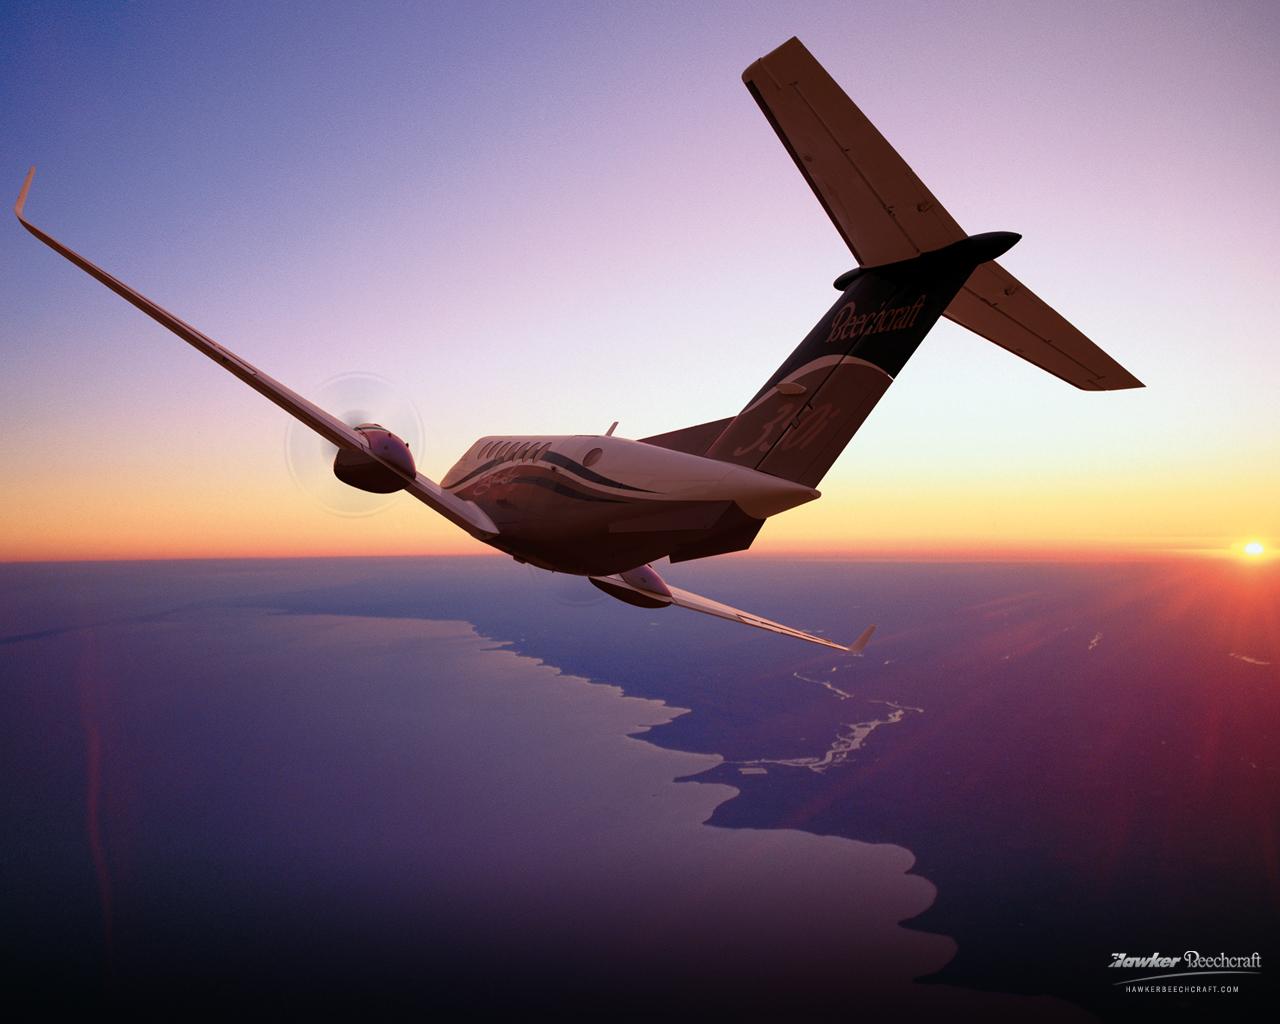 Beechcraft King Air Fleet Surpasses 60 Million Flight Hours